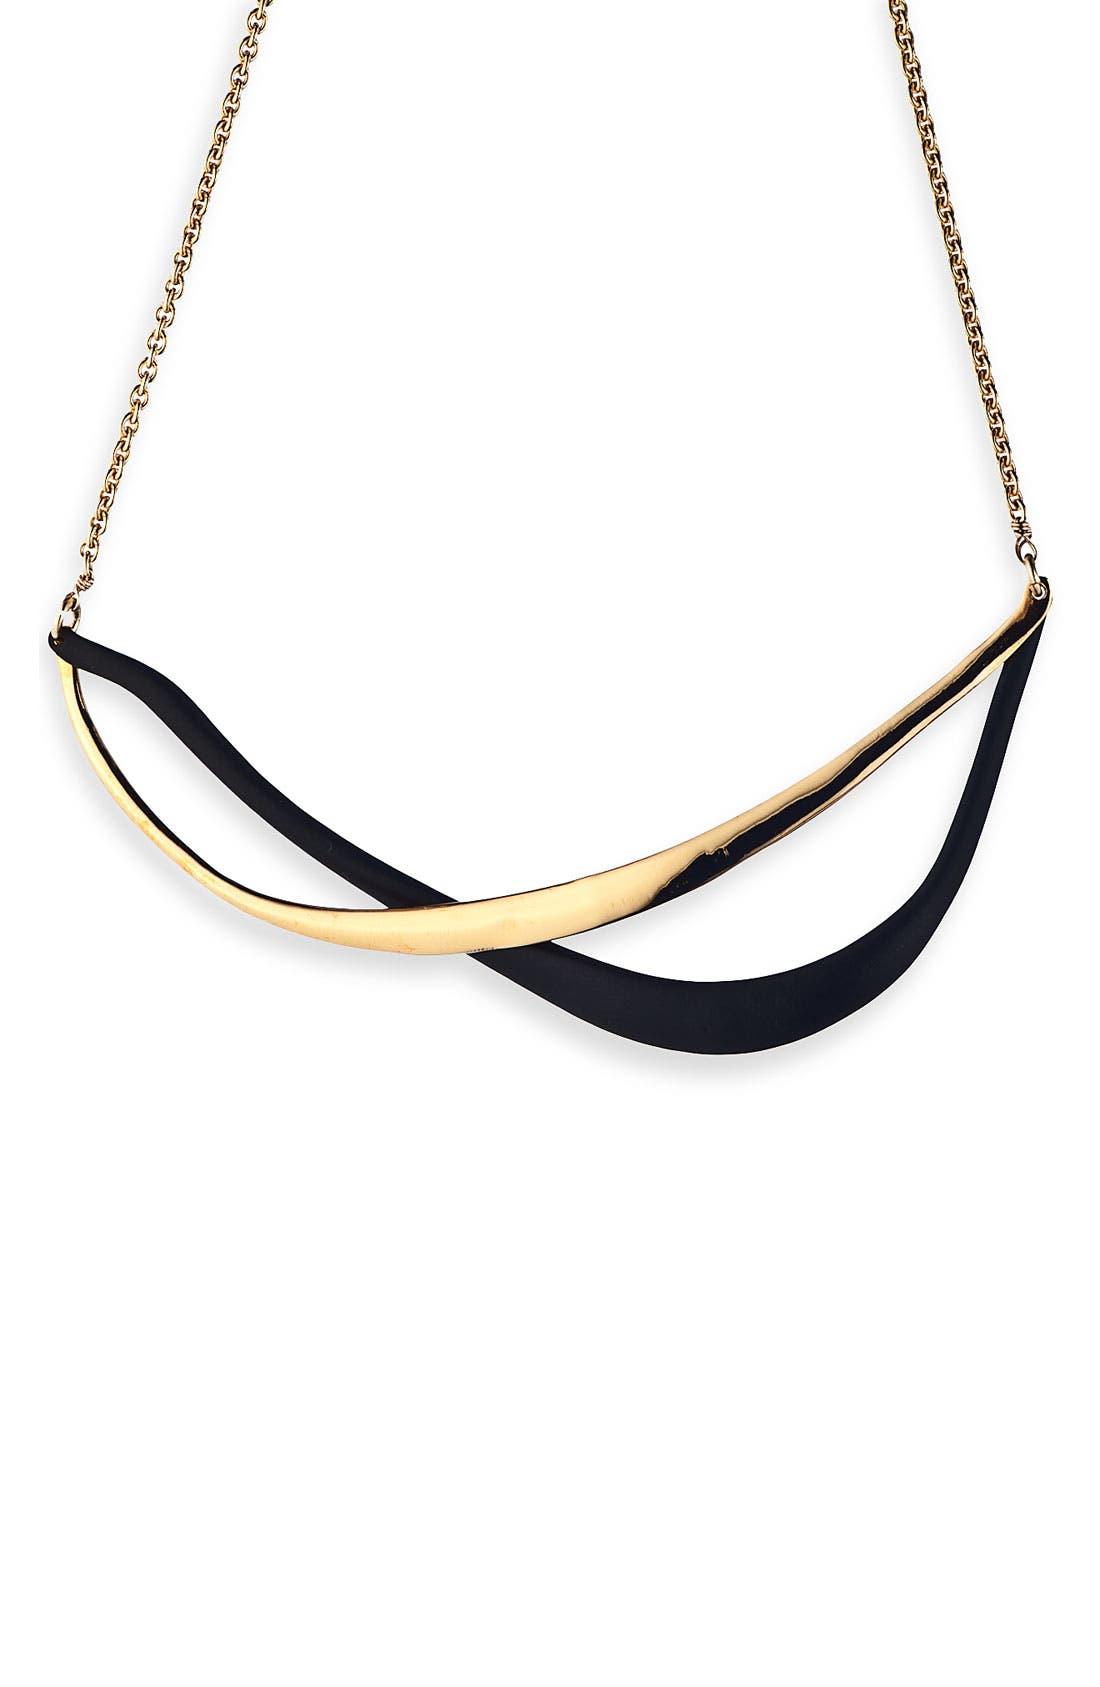 Main Image - Alexis Bittar 'Miss Havisham' Liquid Metal Twined Necklace